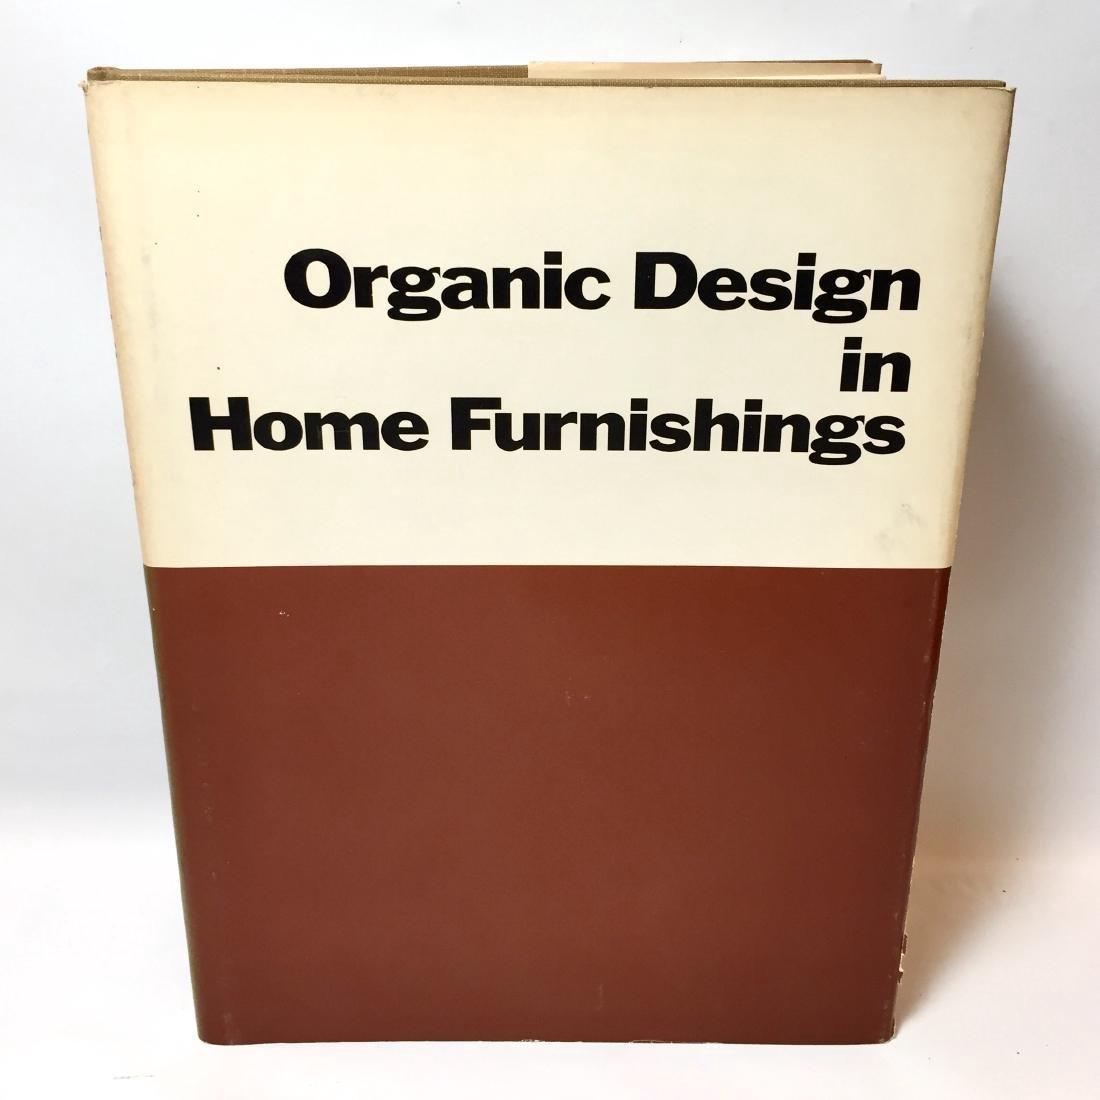 Organic Designs in Home Furnishings Eliot F. Noyes